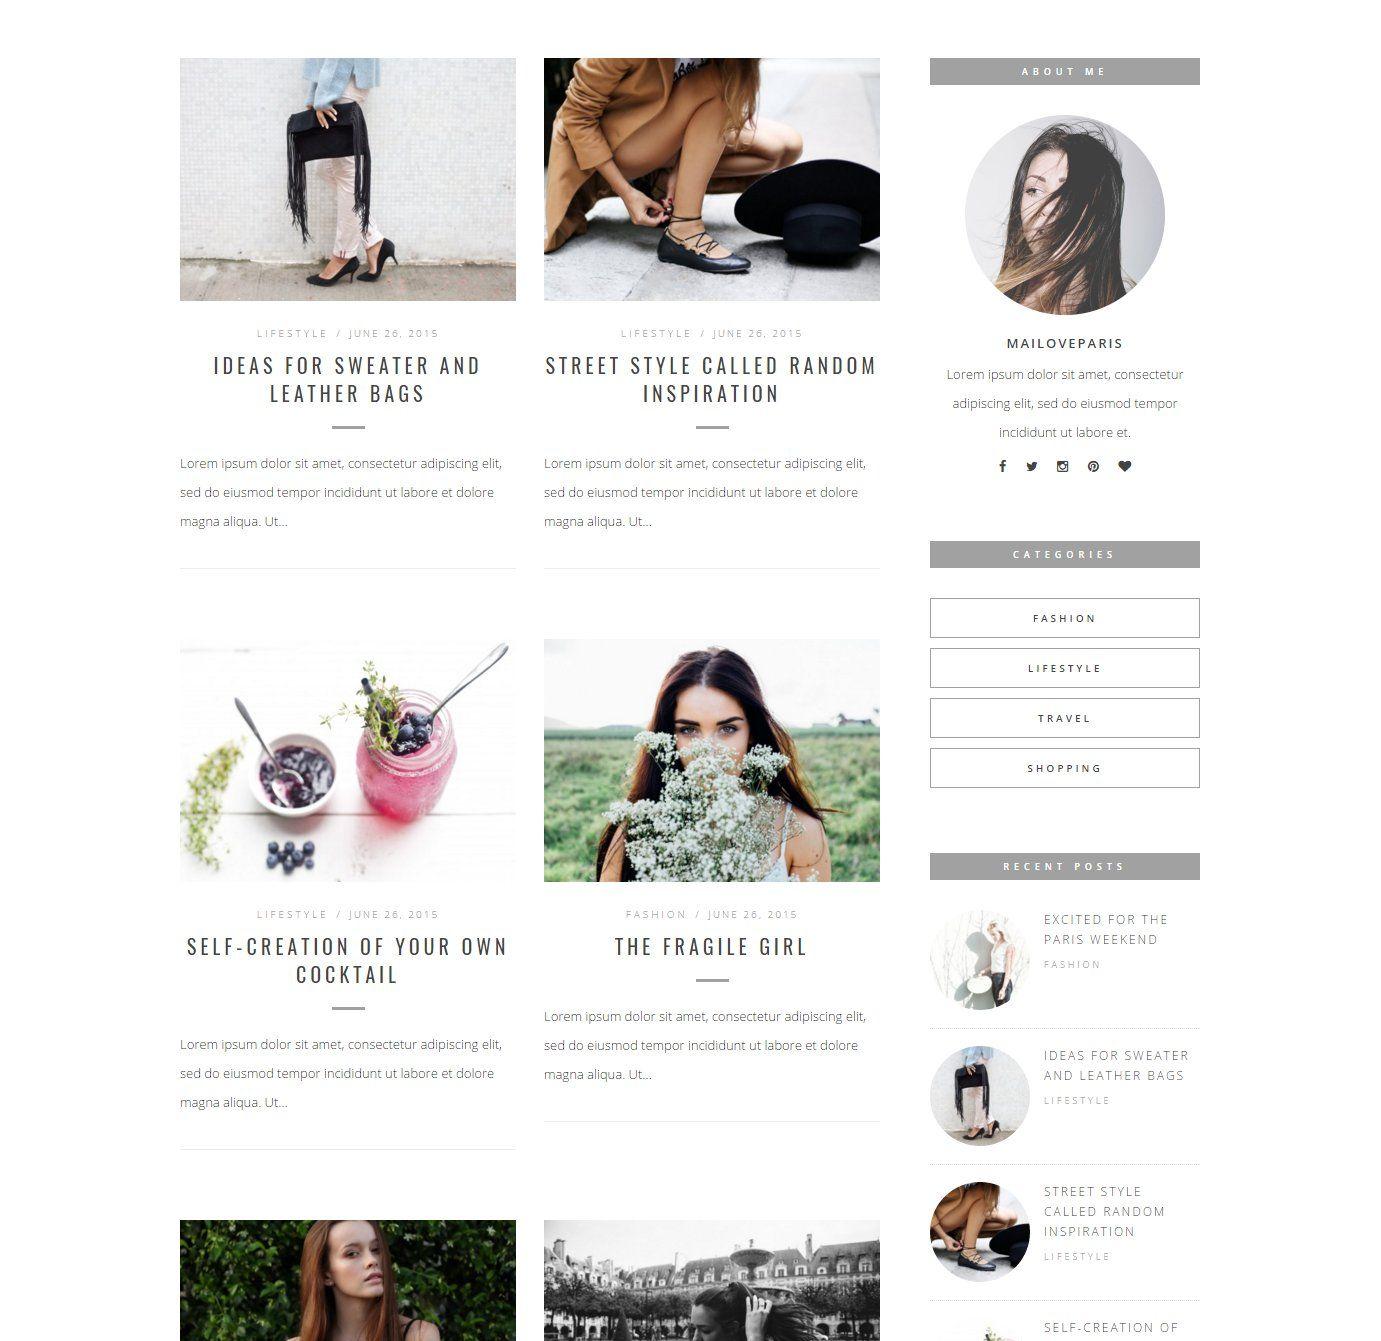 Chloe & Marc Wordpress blog theme by MaiLoveParis on